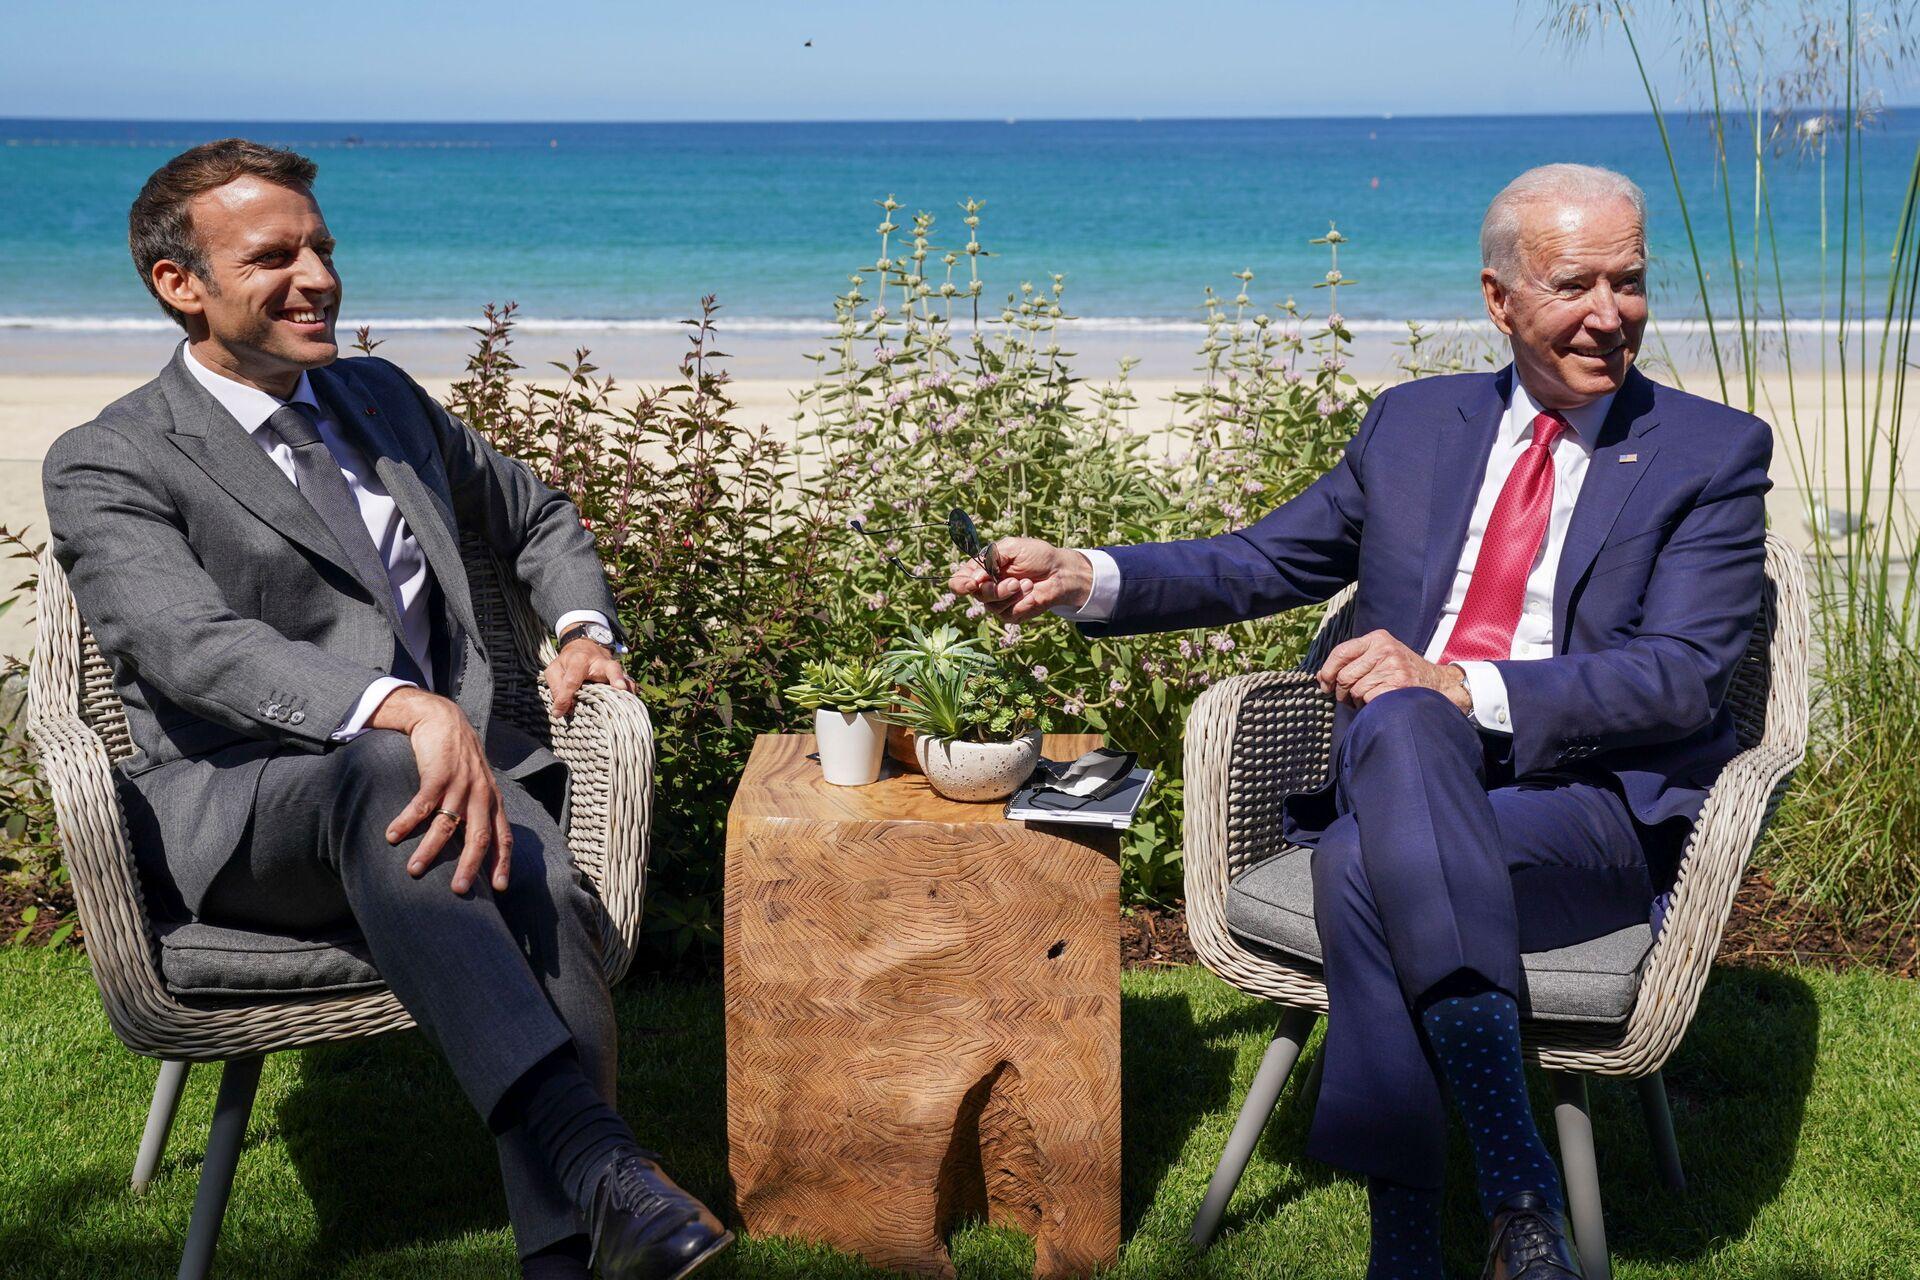 U.S. President Joe Biden and France's President Emmanuel Macron attend a bilateral meeting during the G7 summit in Carbis Bay, Cornwall, Britain, June 12, 2021. - Sputnik International, 1920, 18.09.2021